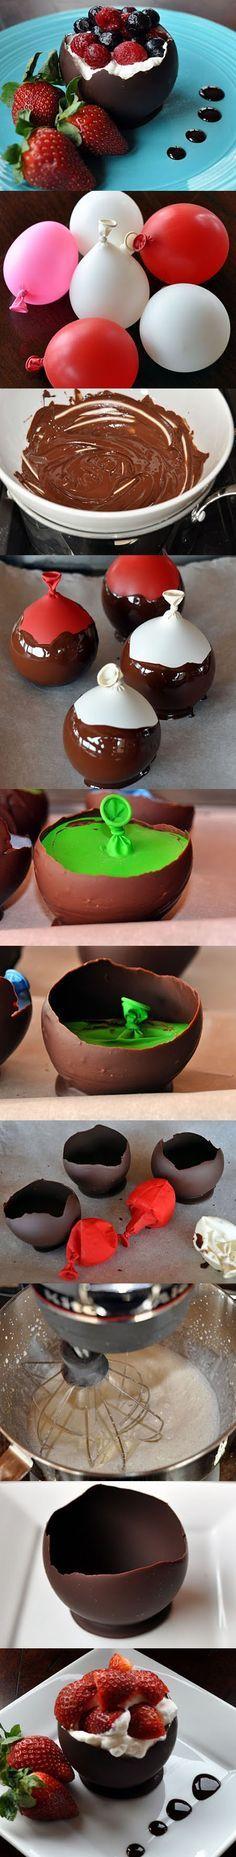 Chocolate bowl!